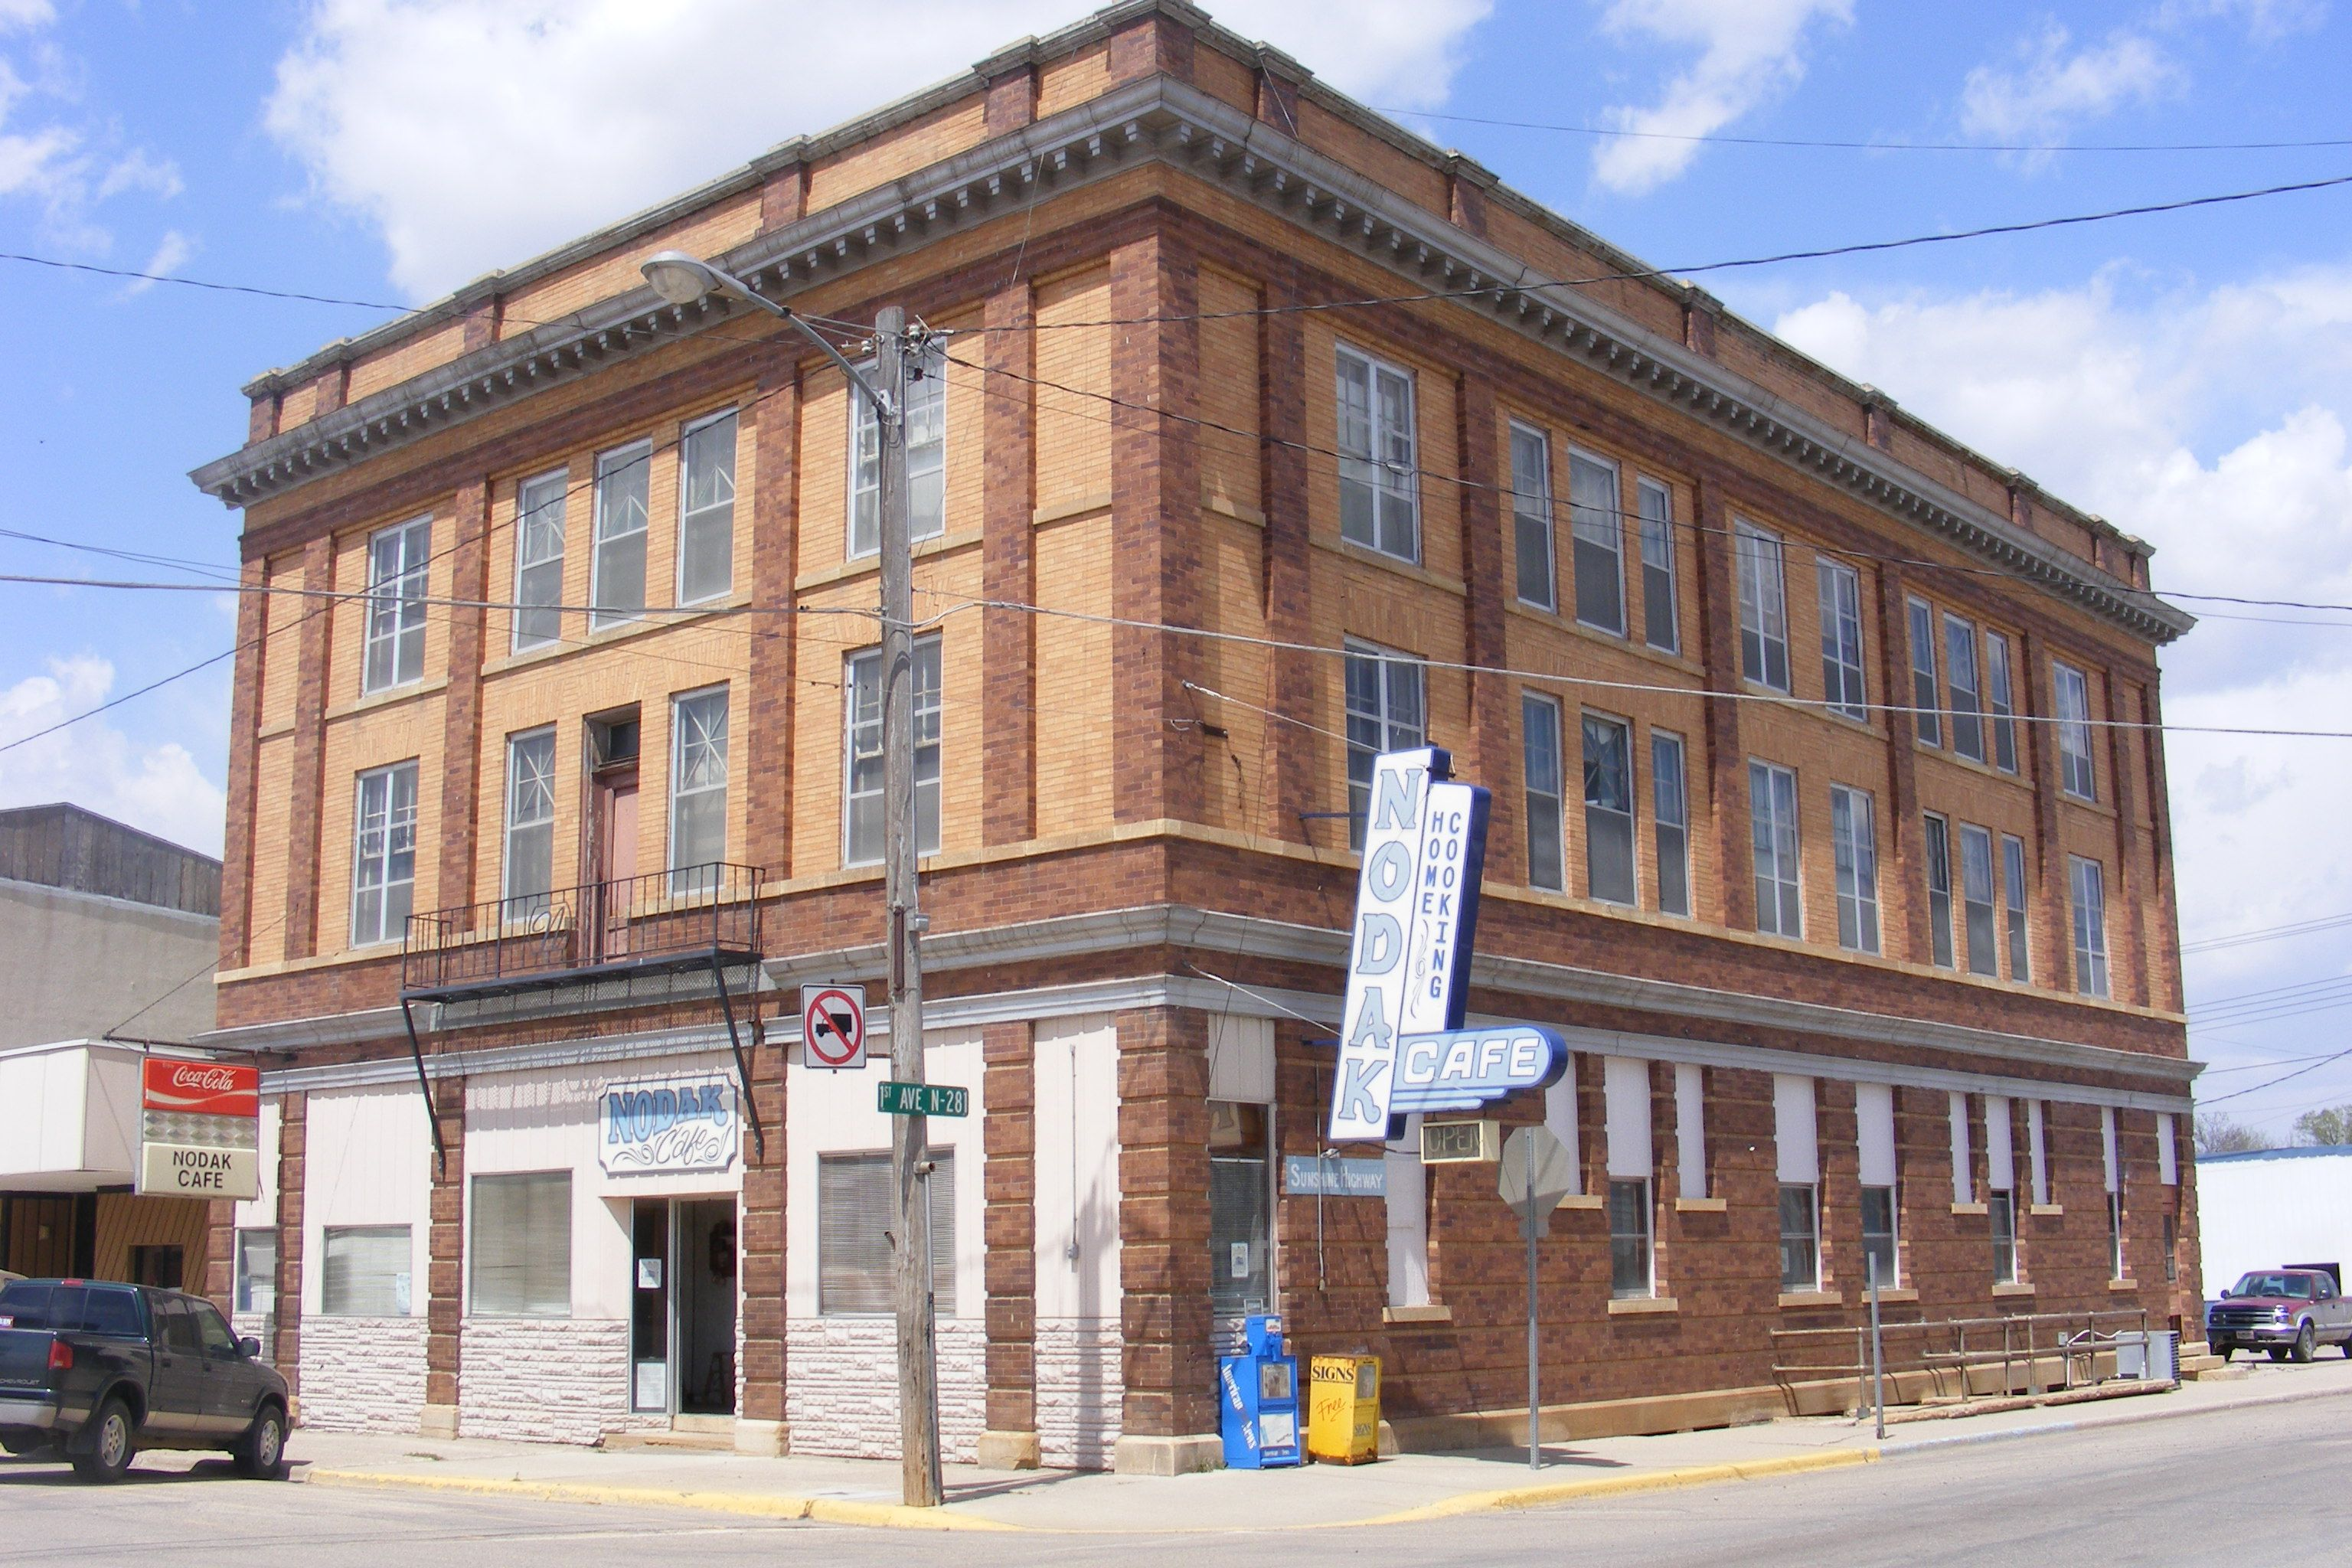 Ellendale North Dakota Where I Grew Up This Is The Nodak Hotel And Restaurant Places Favorite Places North Dakota